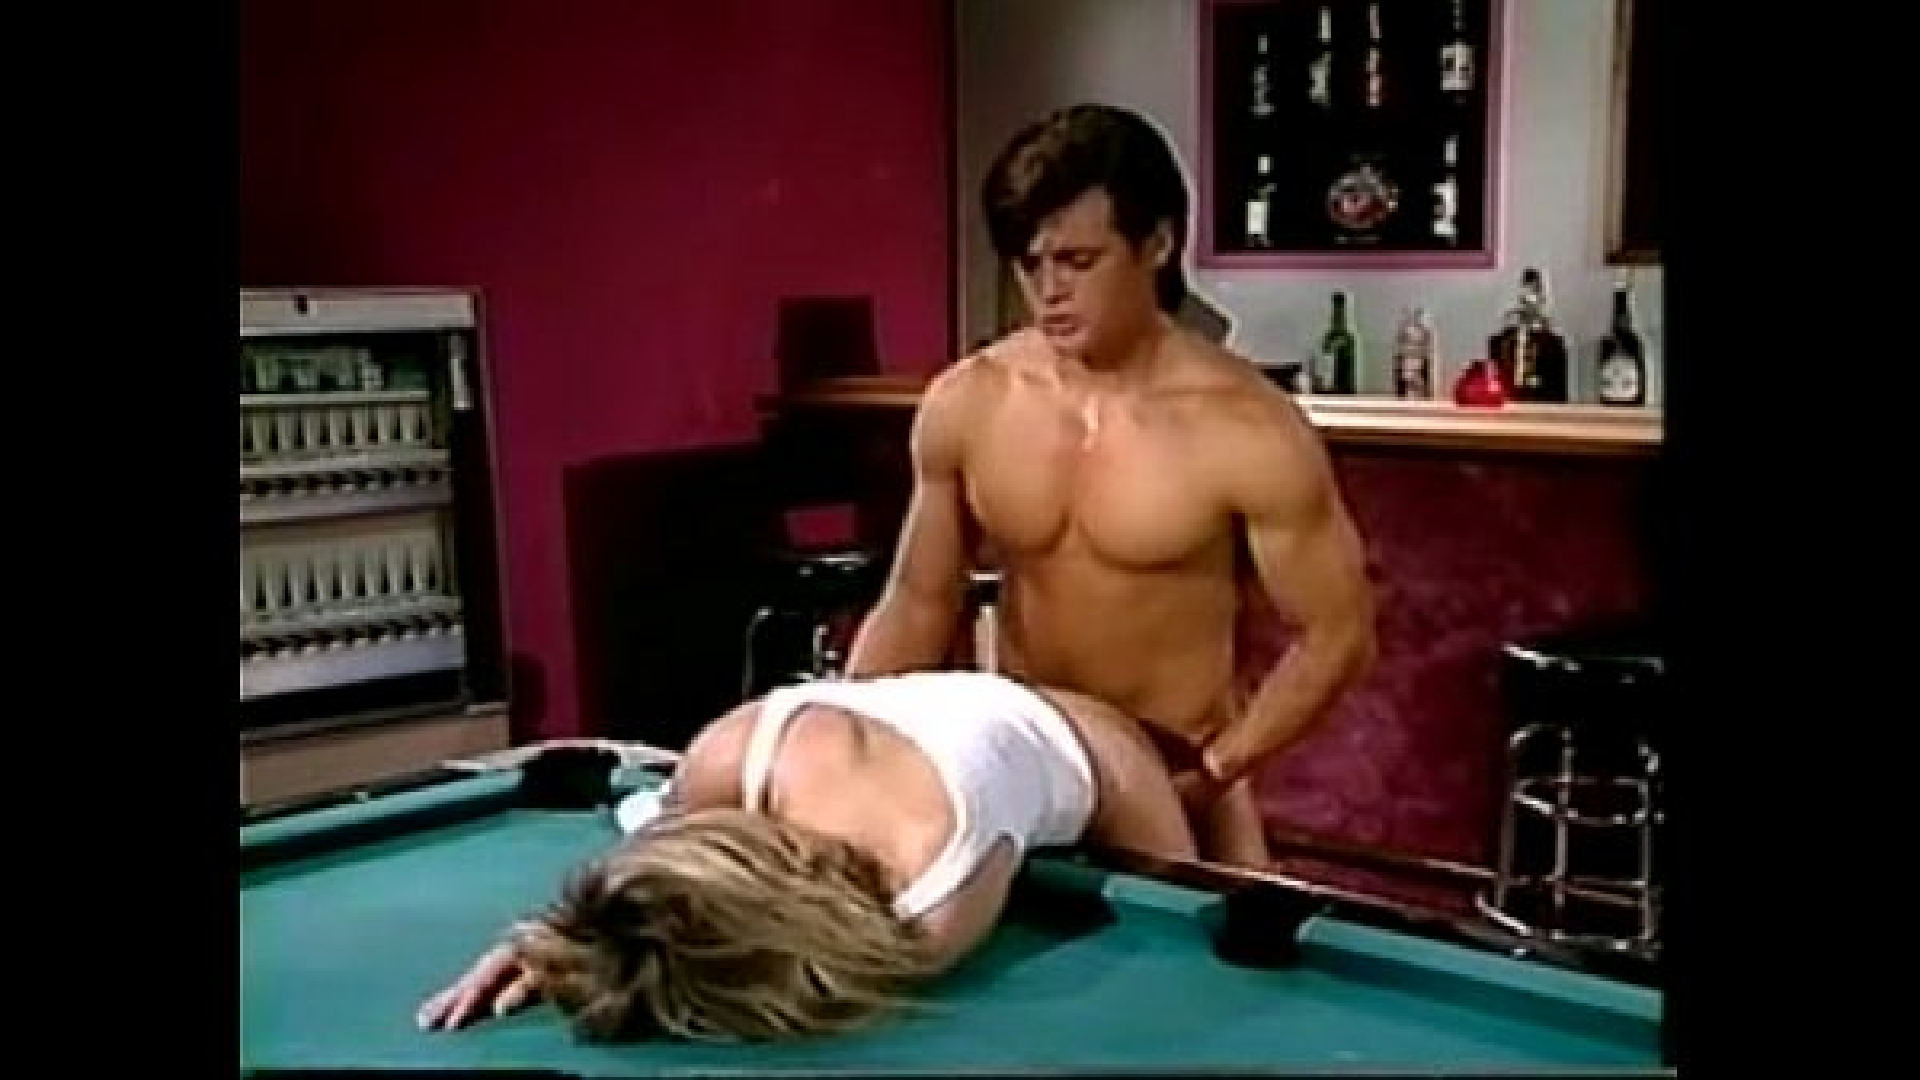 Jeff stryker analand white nude@todorazor.com